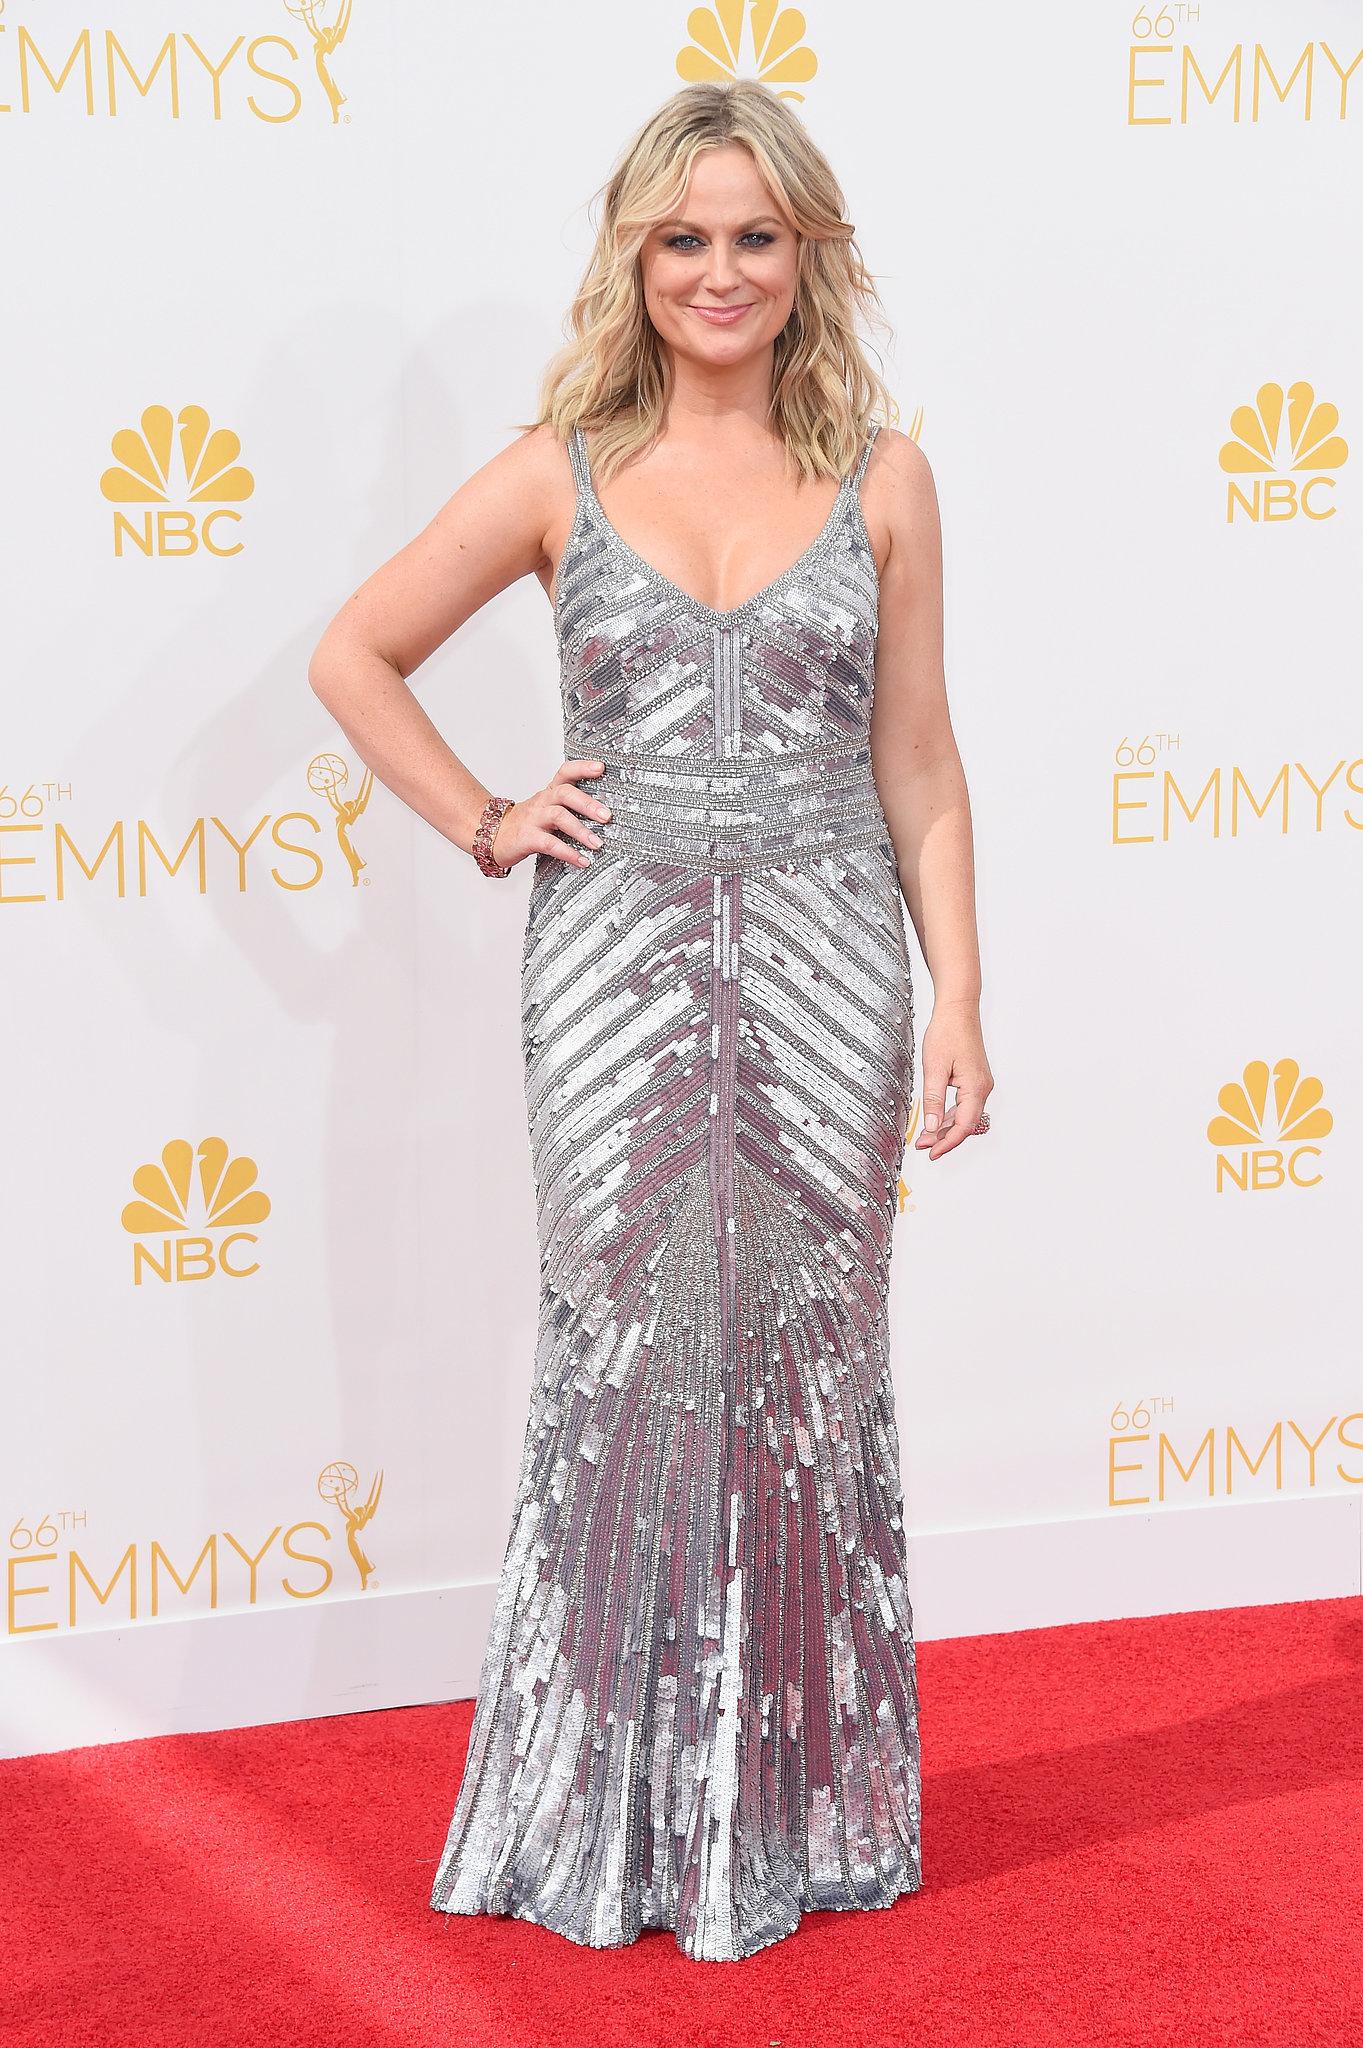 Amy Poehler at the 2014 Emmy Awards